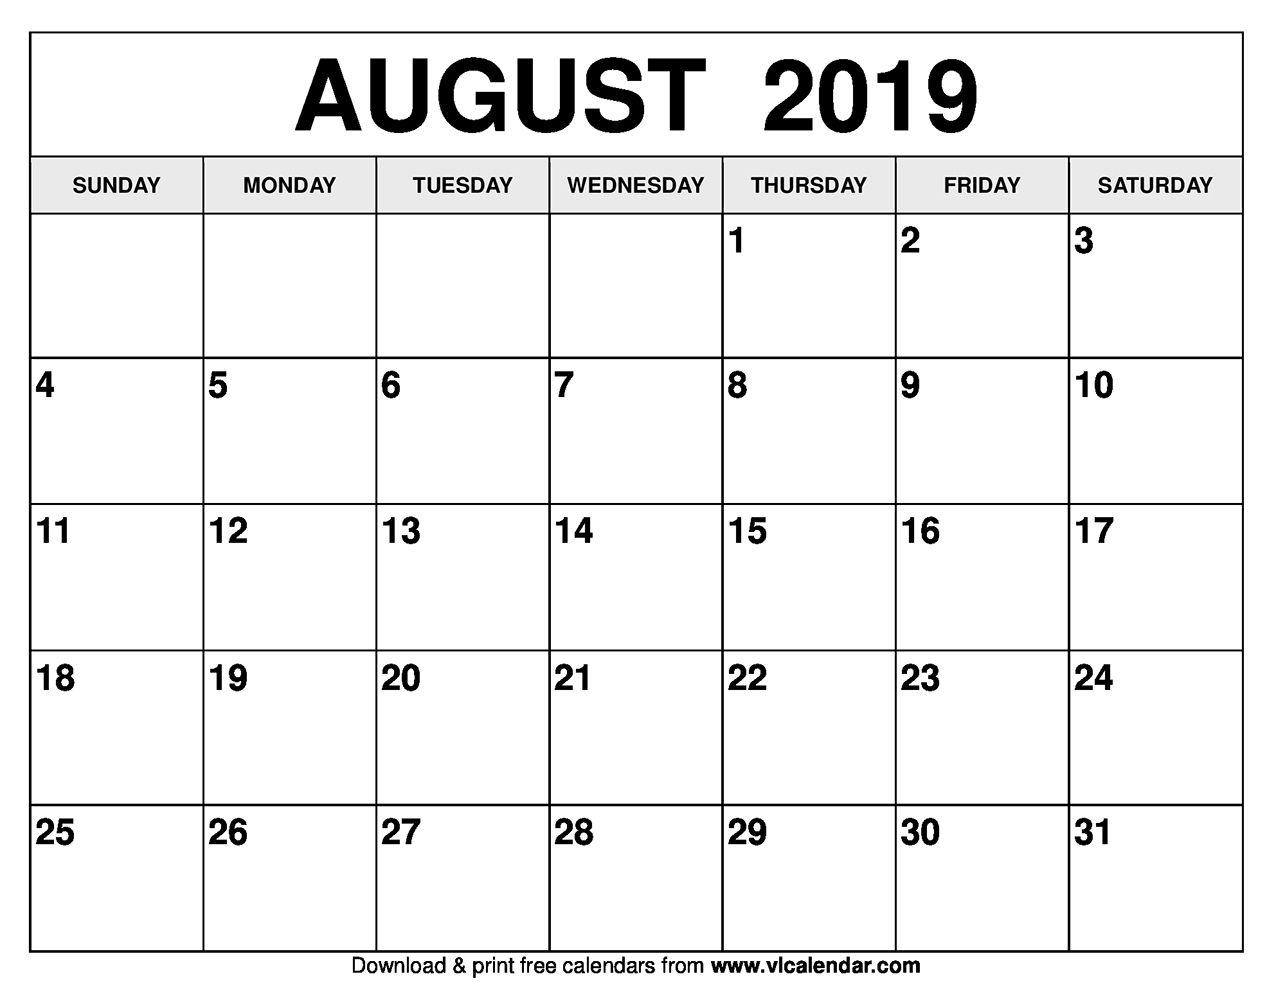 August 2019 Calendar Printable Templates Dowload Calendar